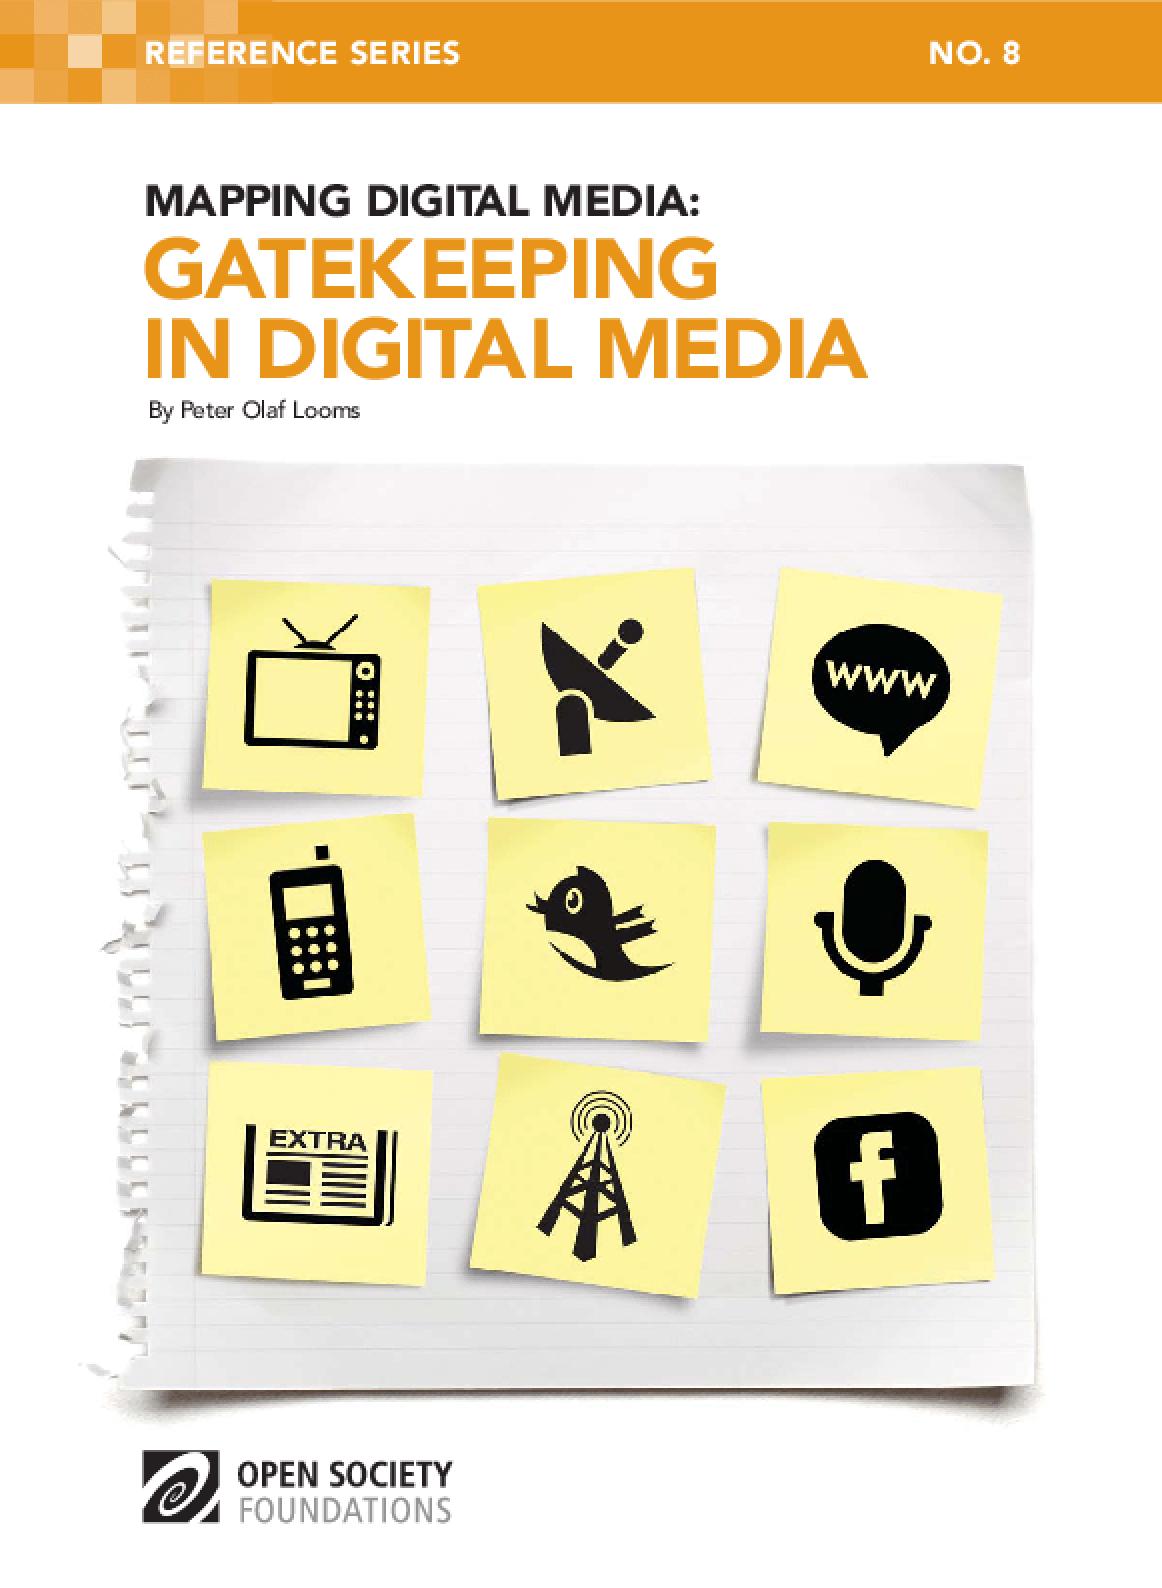 Mapping Digital Media: Gatekeeping in Digital Media